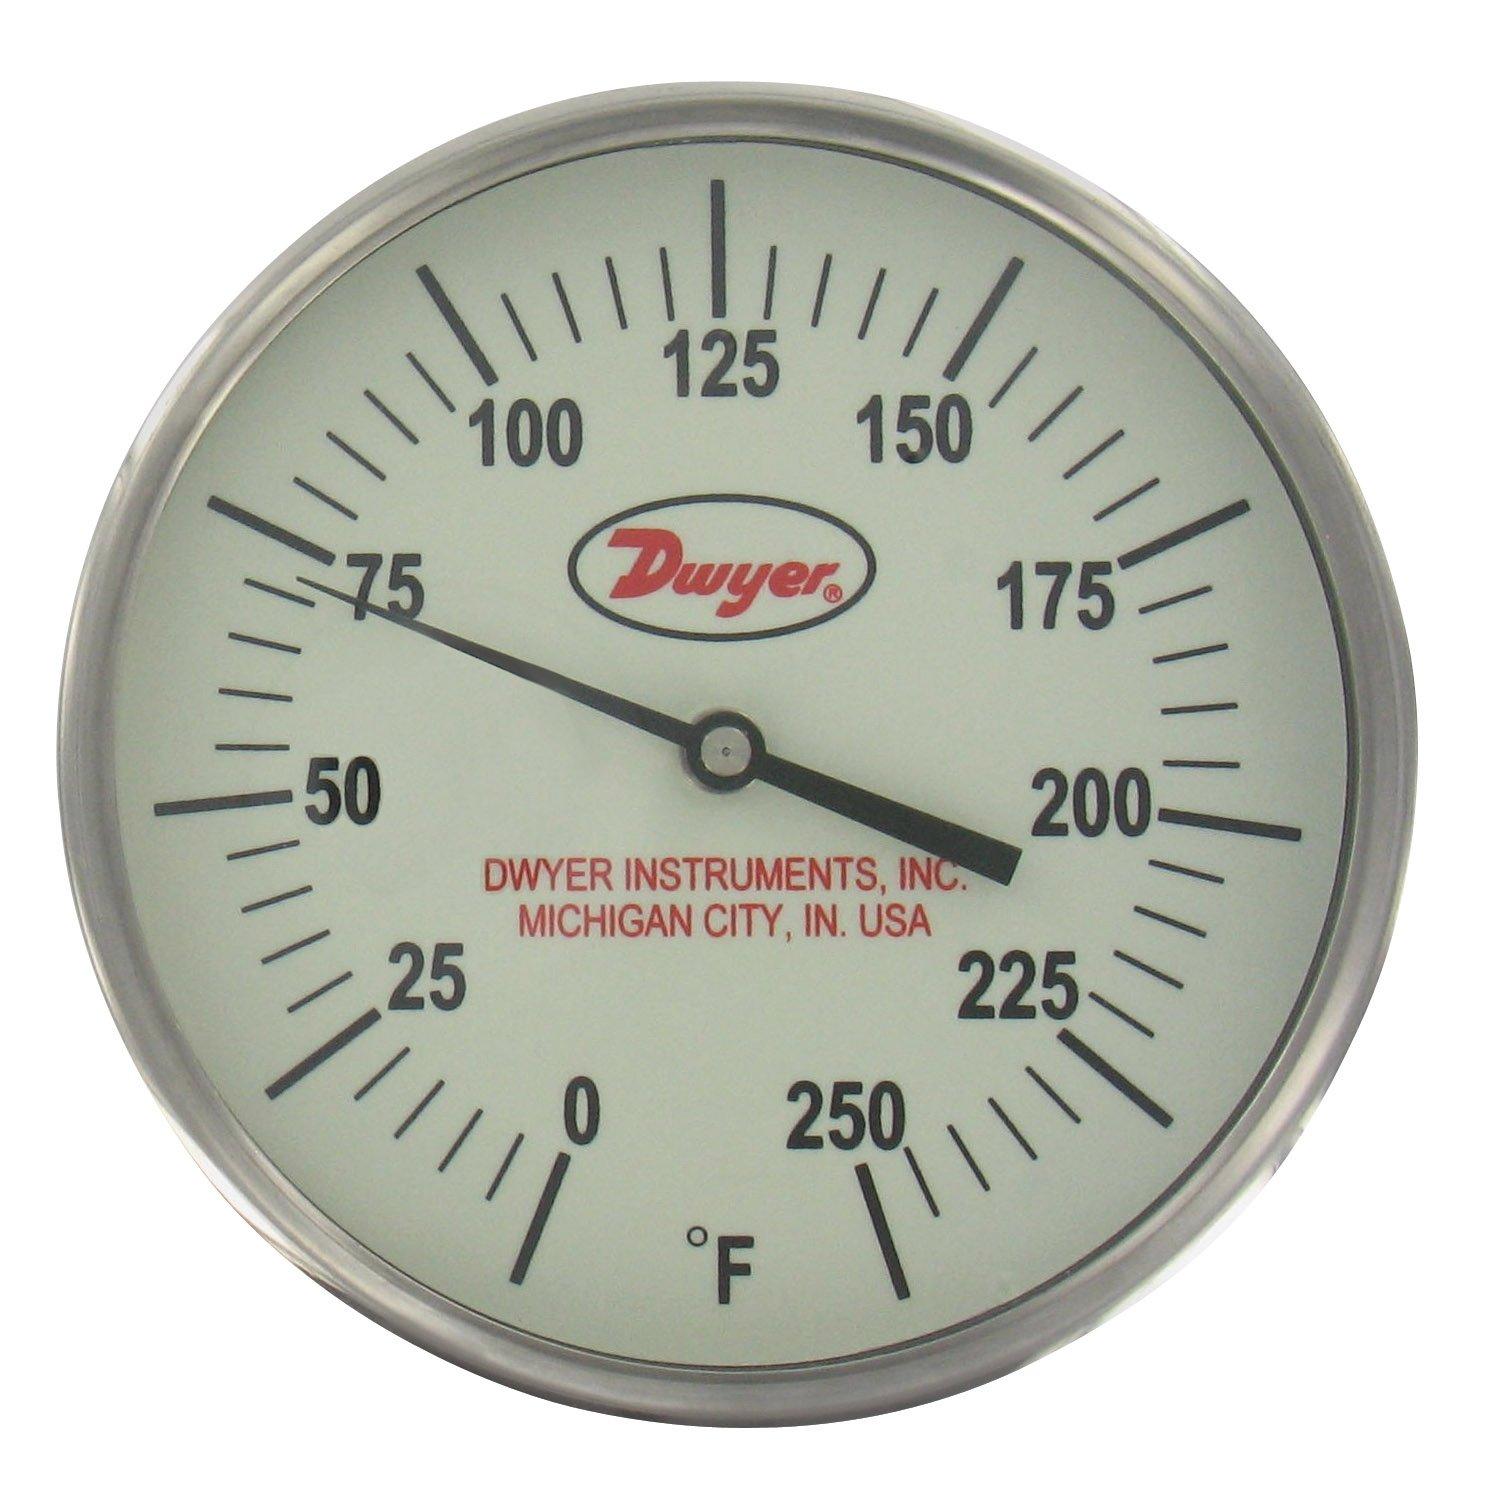 Dwyer® Glow-in-the-Dark Bimetal Thermometer, GBTB52561, 50-300°F, 2-1/2'' Stem, Back Connection